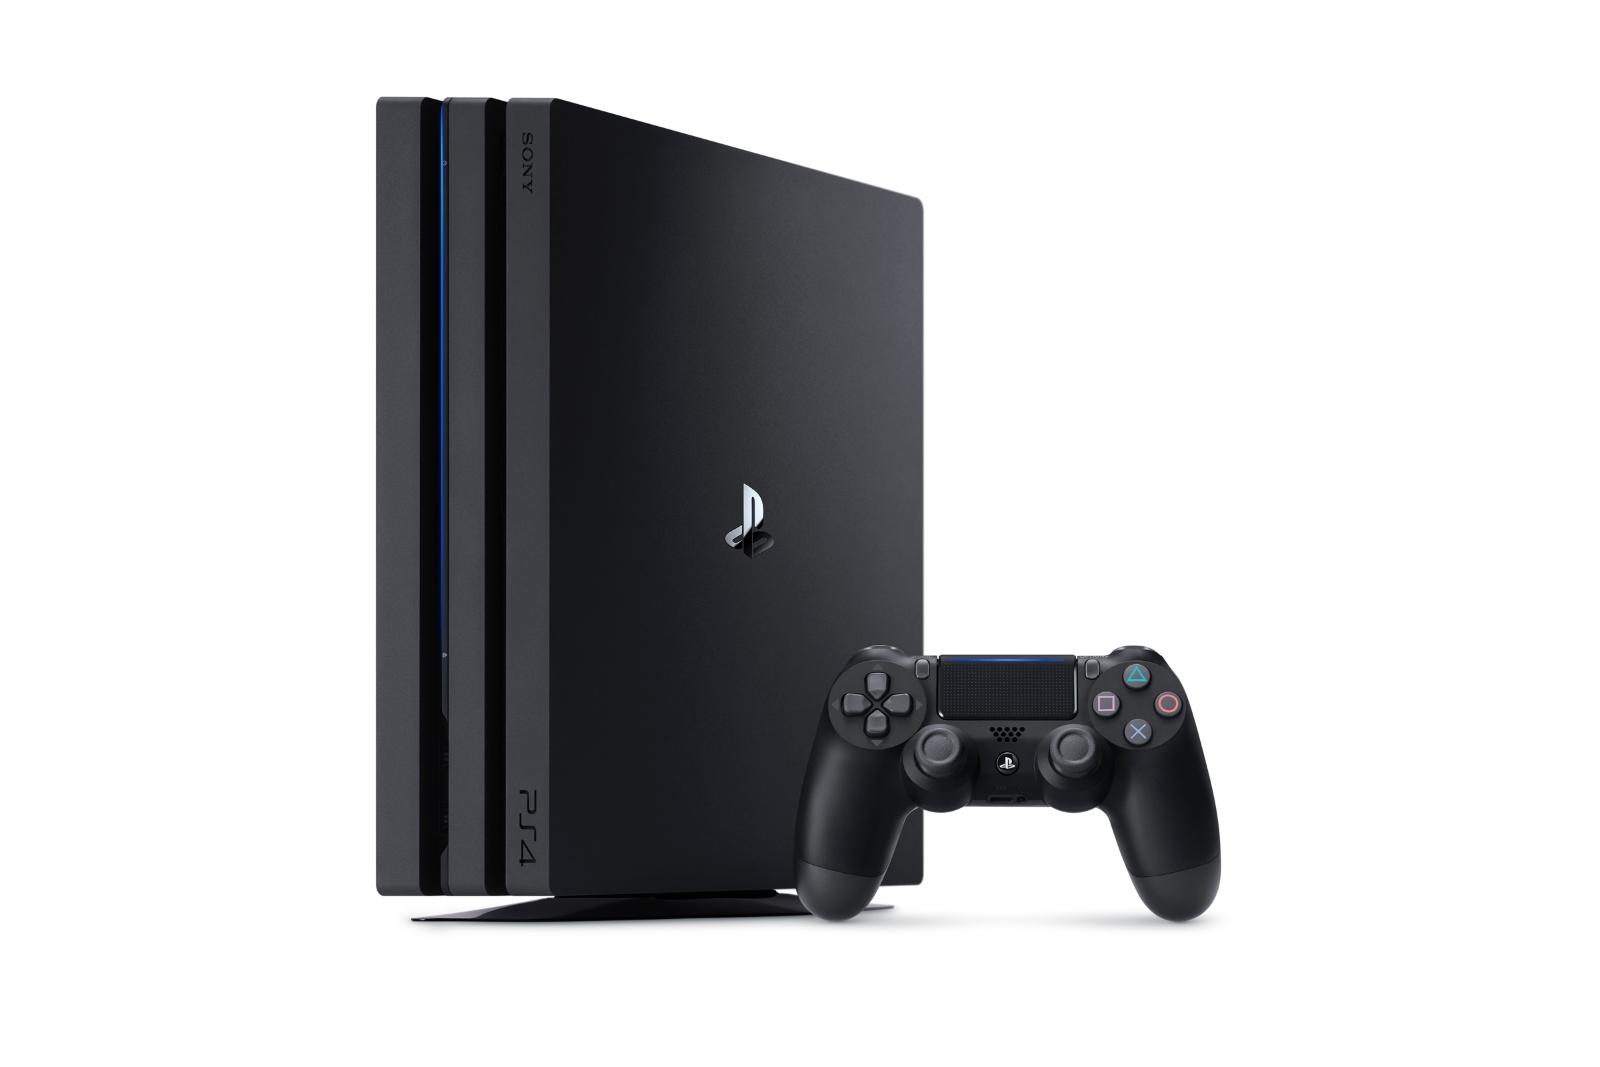 送料無料 新品 SONY PlayStation4 CUH-7200CB01 2TB 4807